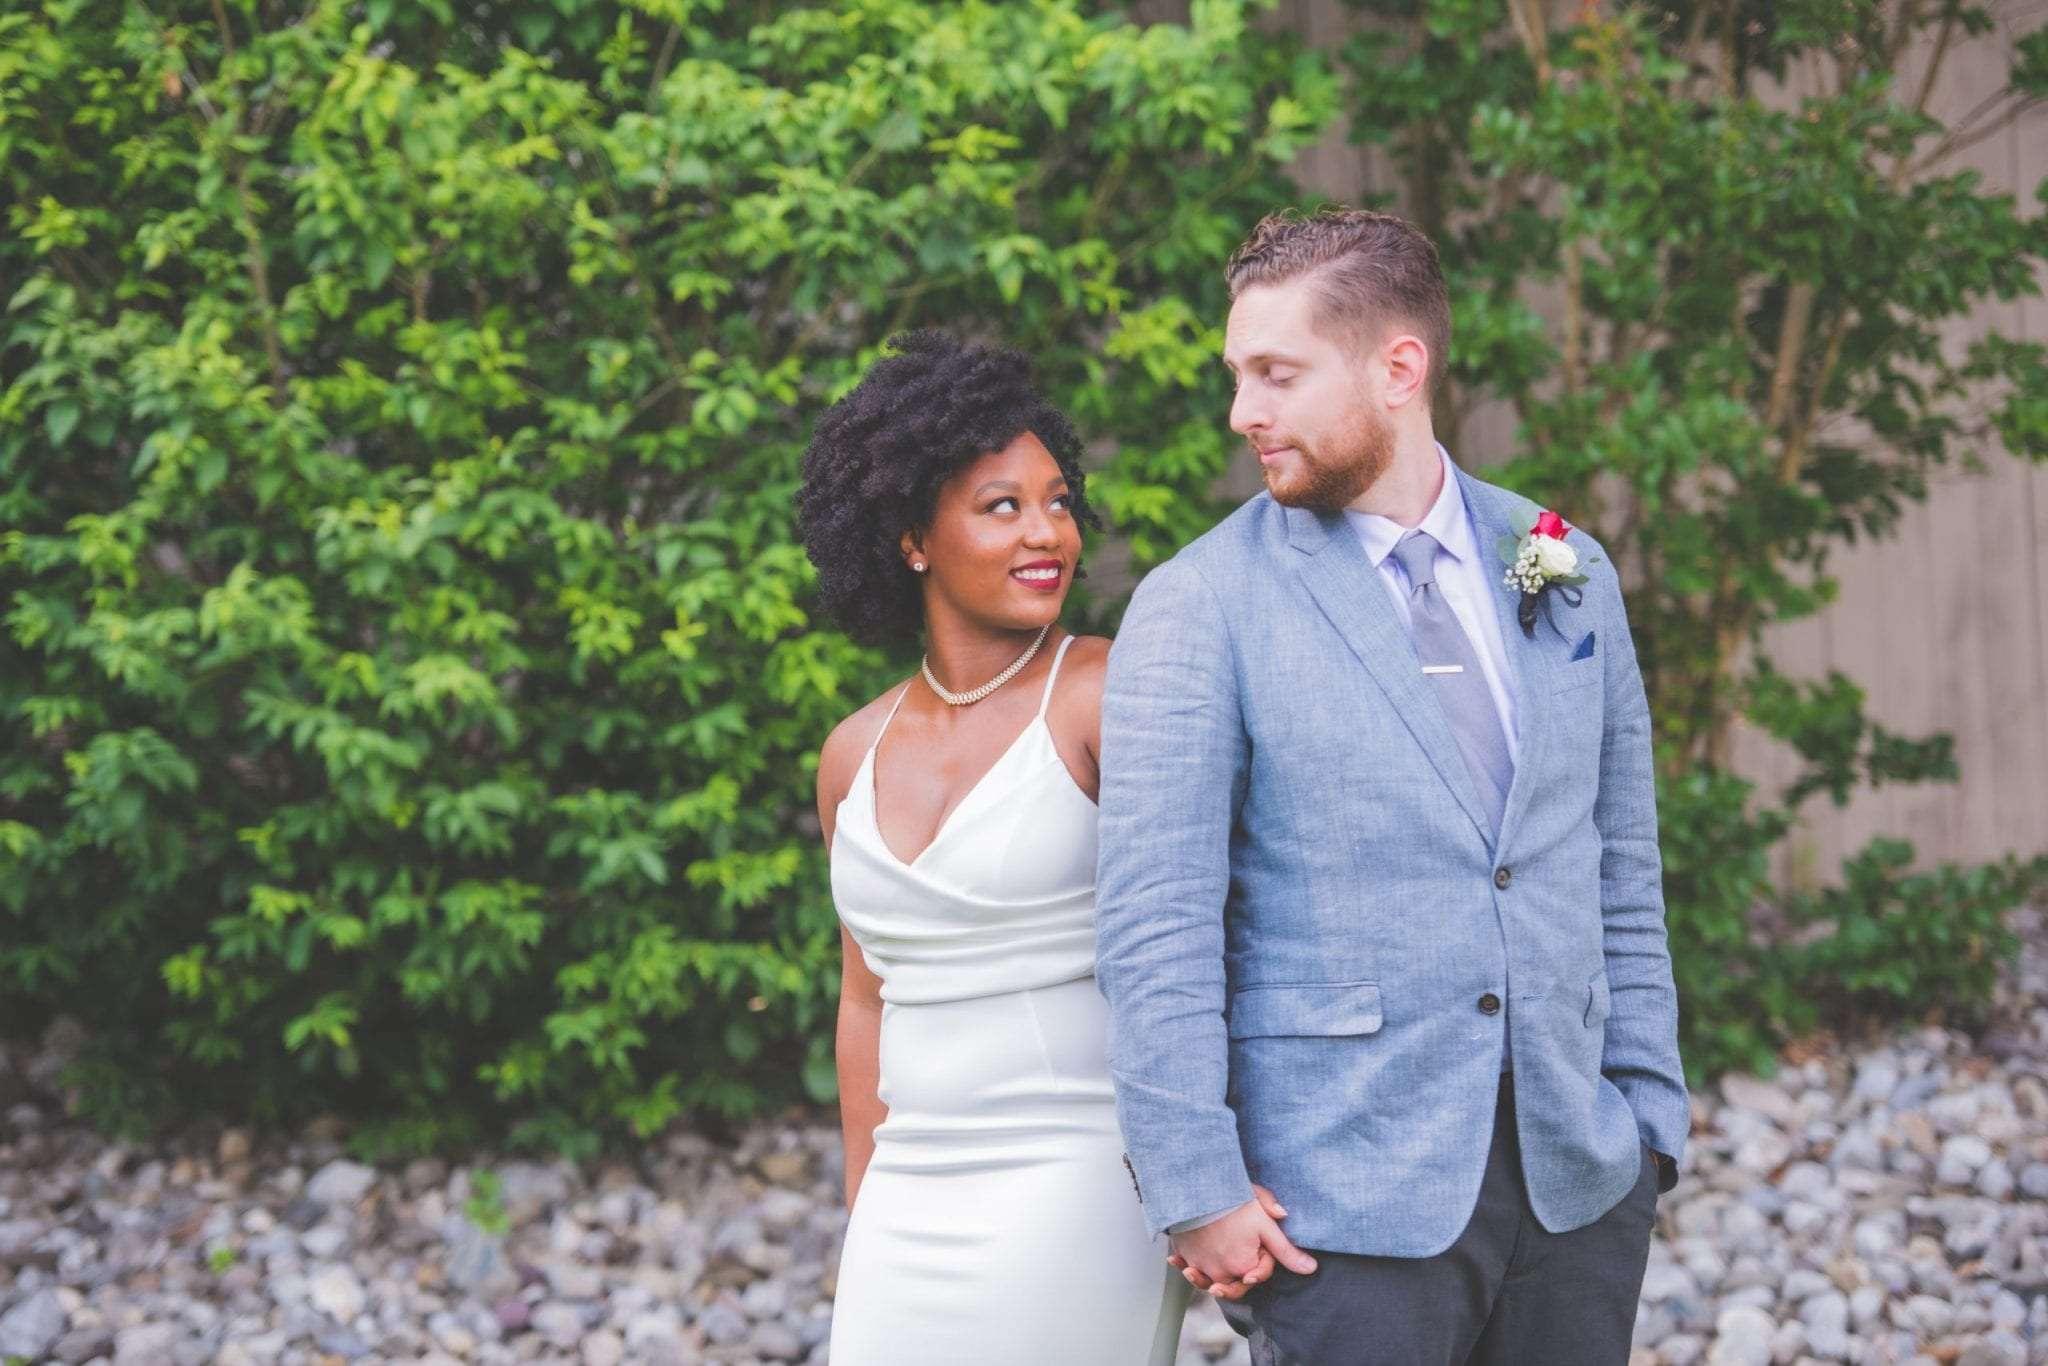 backyard wedding in NJ social distancing